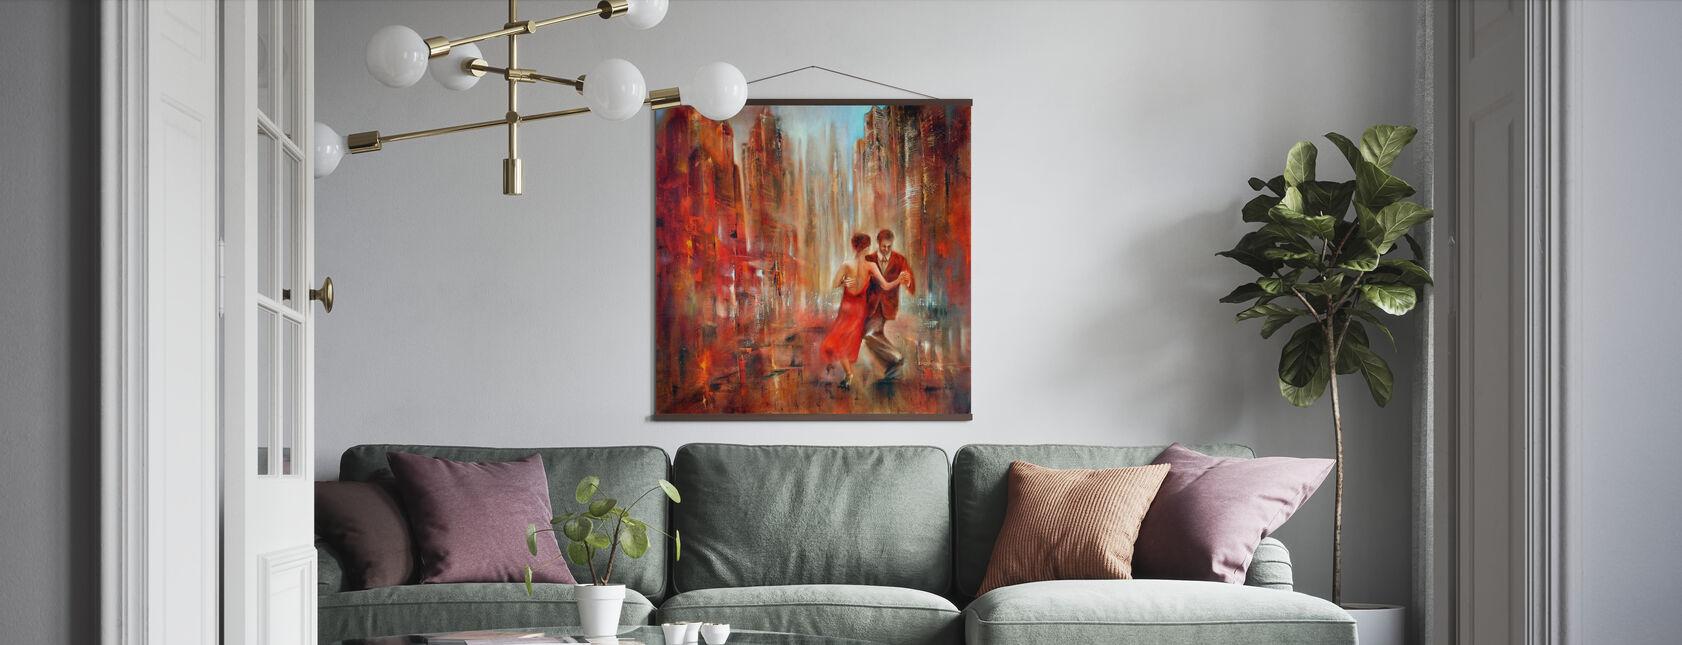 Tango - Plakat - Stue